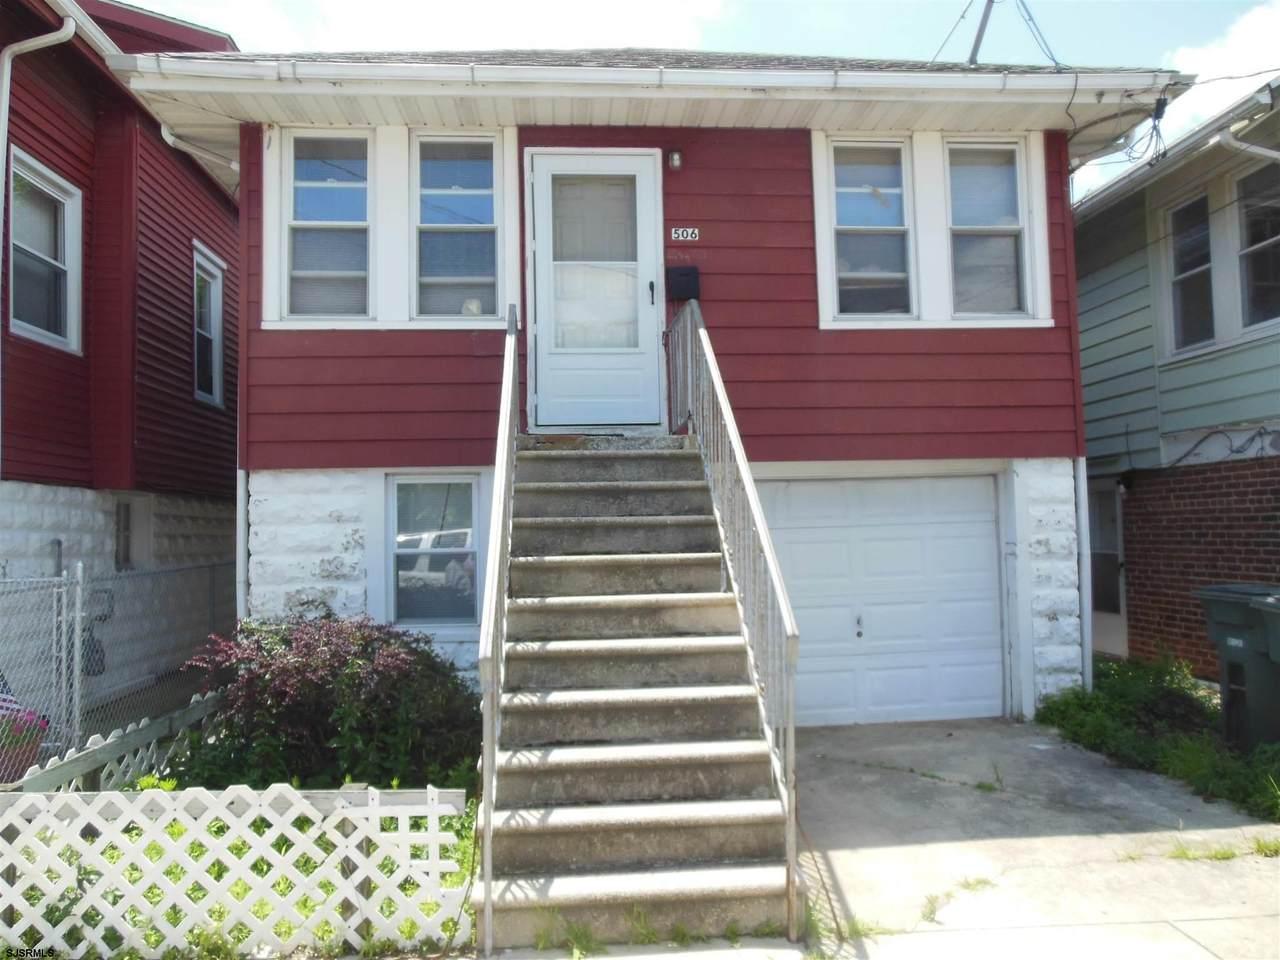 506 New Jersey - Photo 1